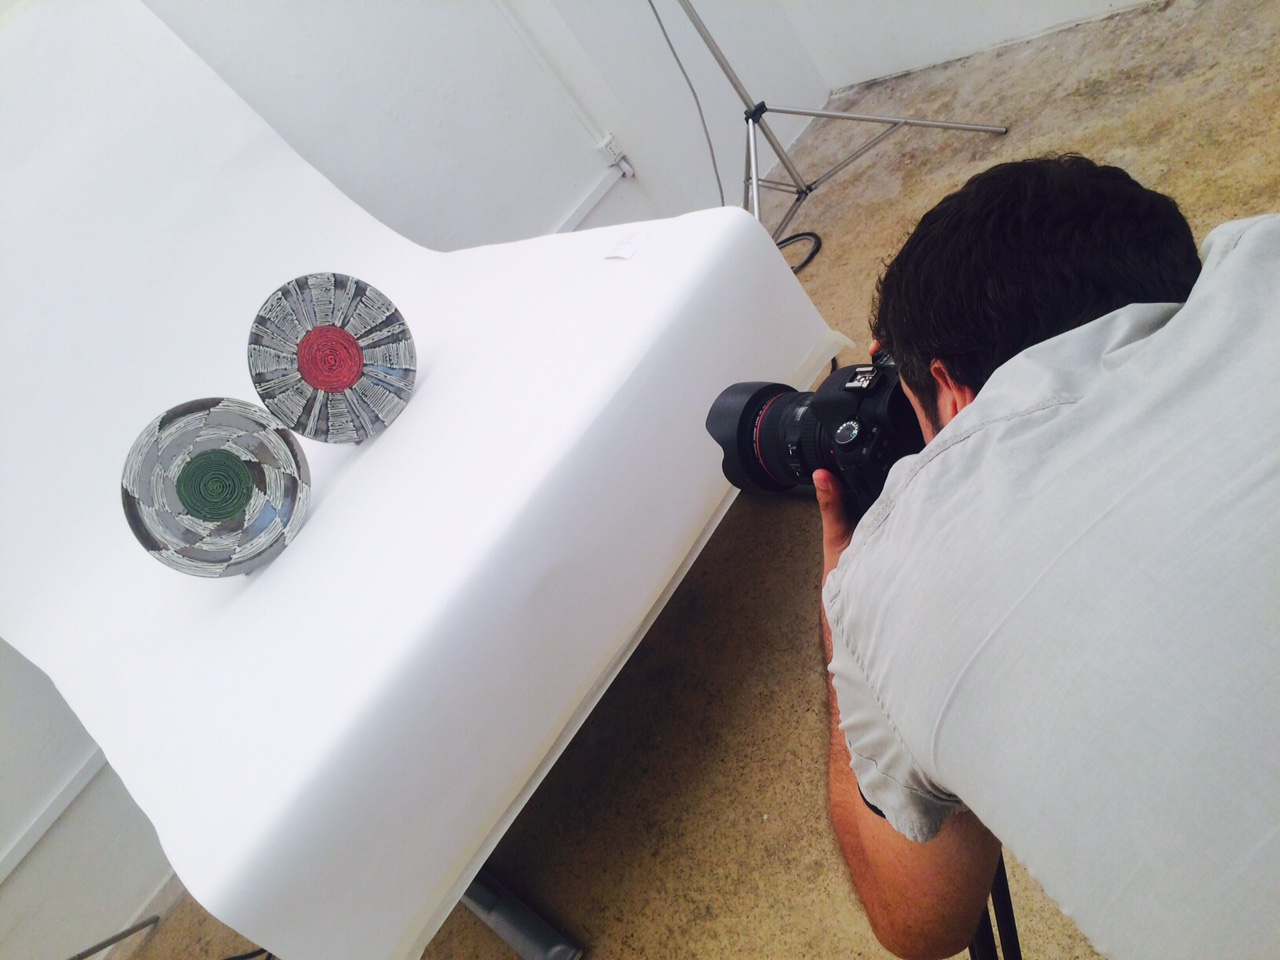 Allestimento set per shooting Mostra della Ceramica 2015